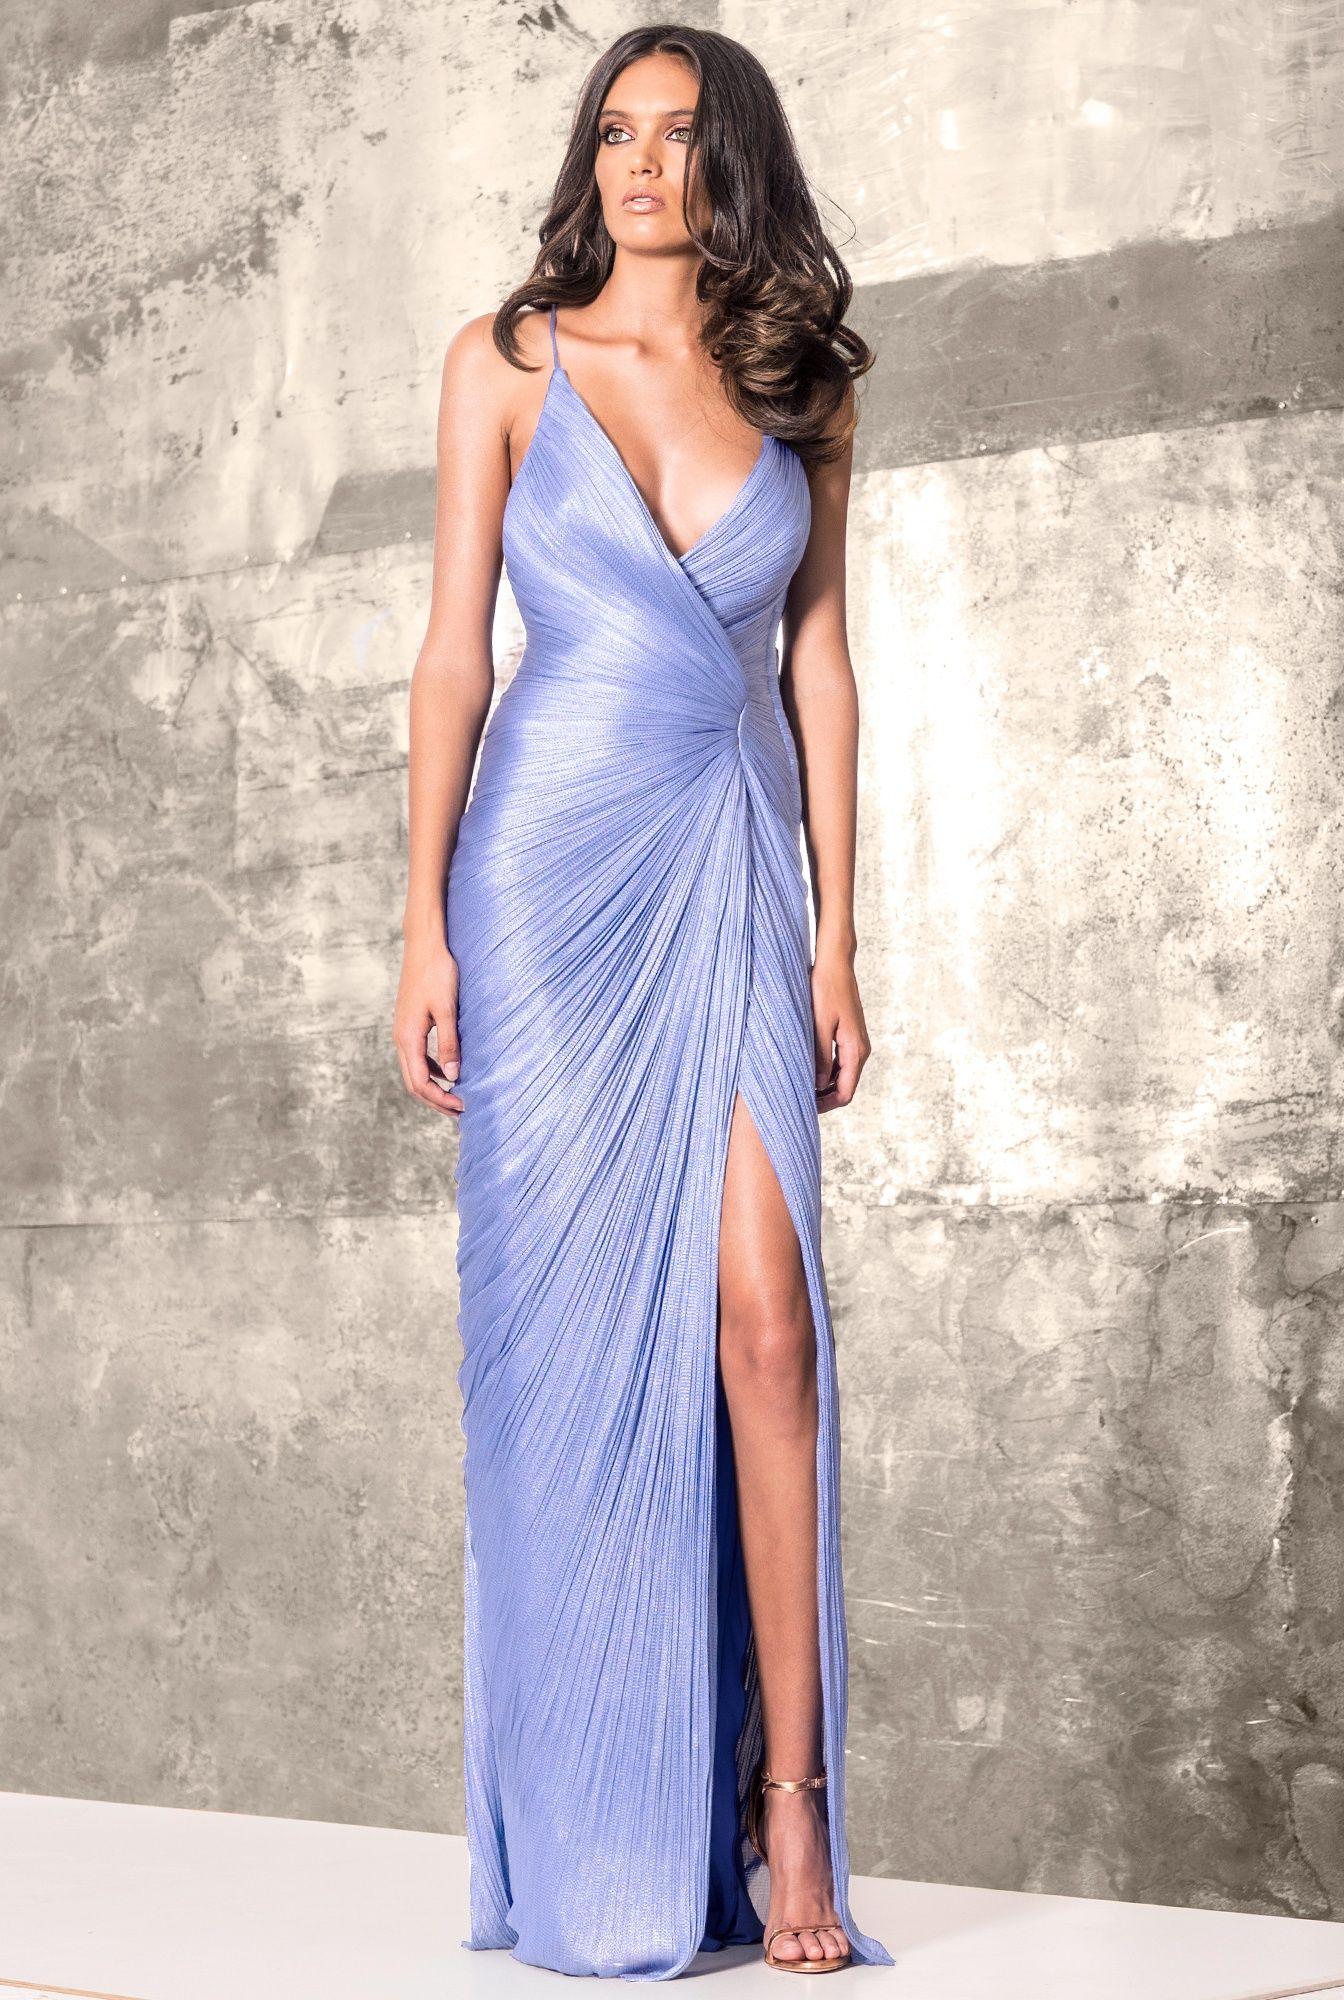 Click here to buy Maria Lucia Hohan NOIRA dress at MLHSHOPCOM